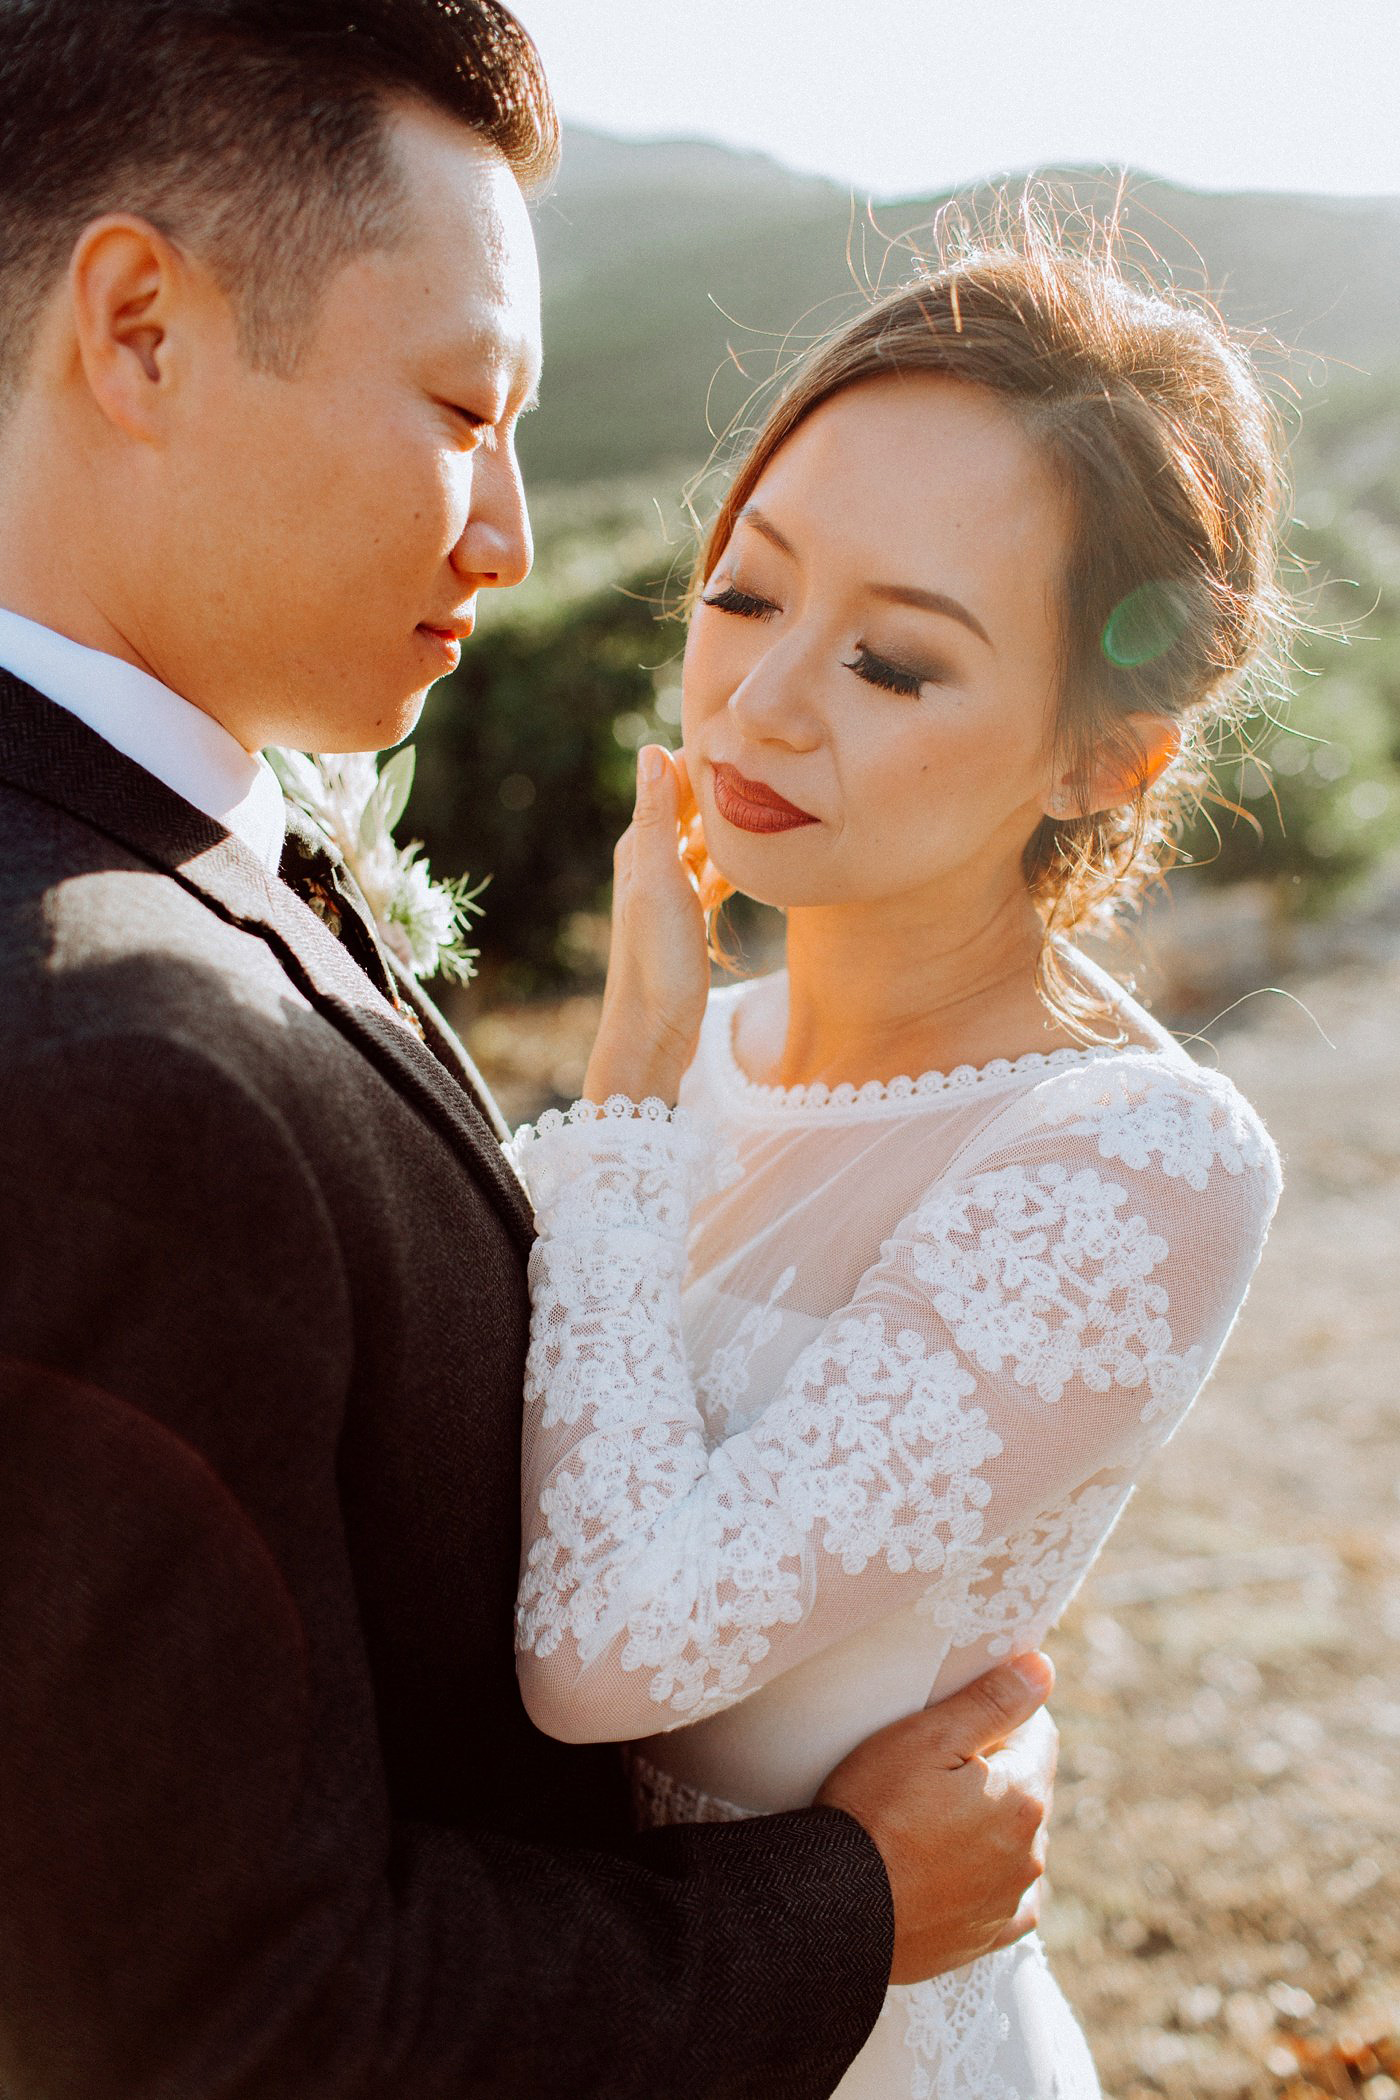 bold lipstick bride and groom embrace close up